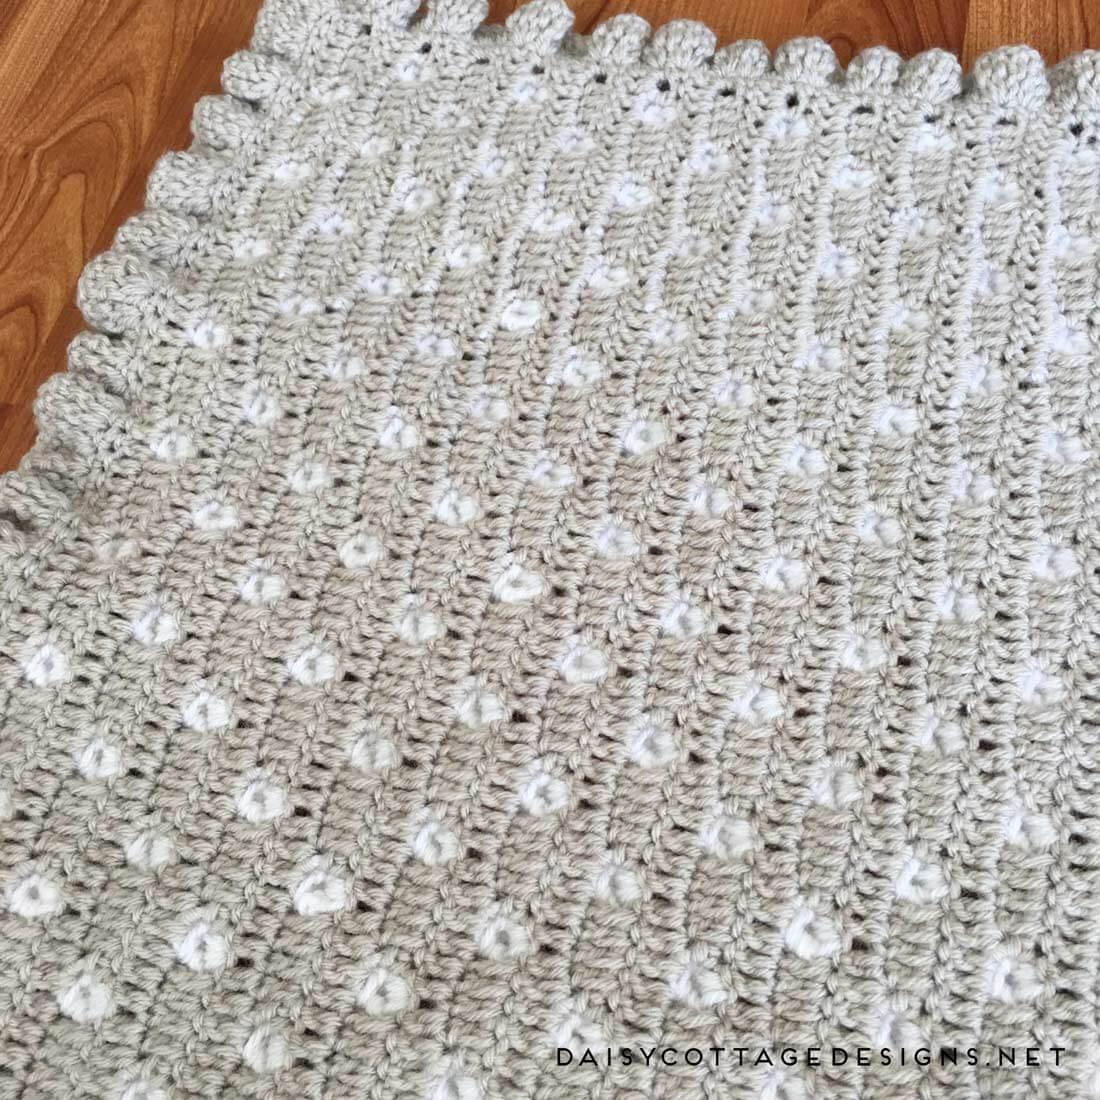 Crochet Baby Blanket Patterns free crochet pattern | crochet blanket pattern | crochet baby blanket | bzmtwpj